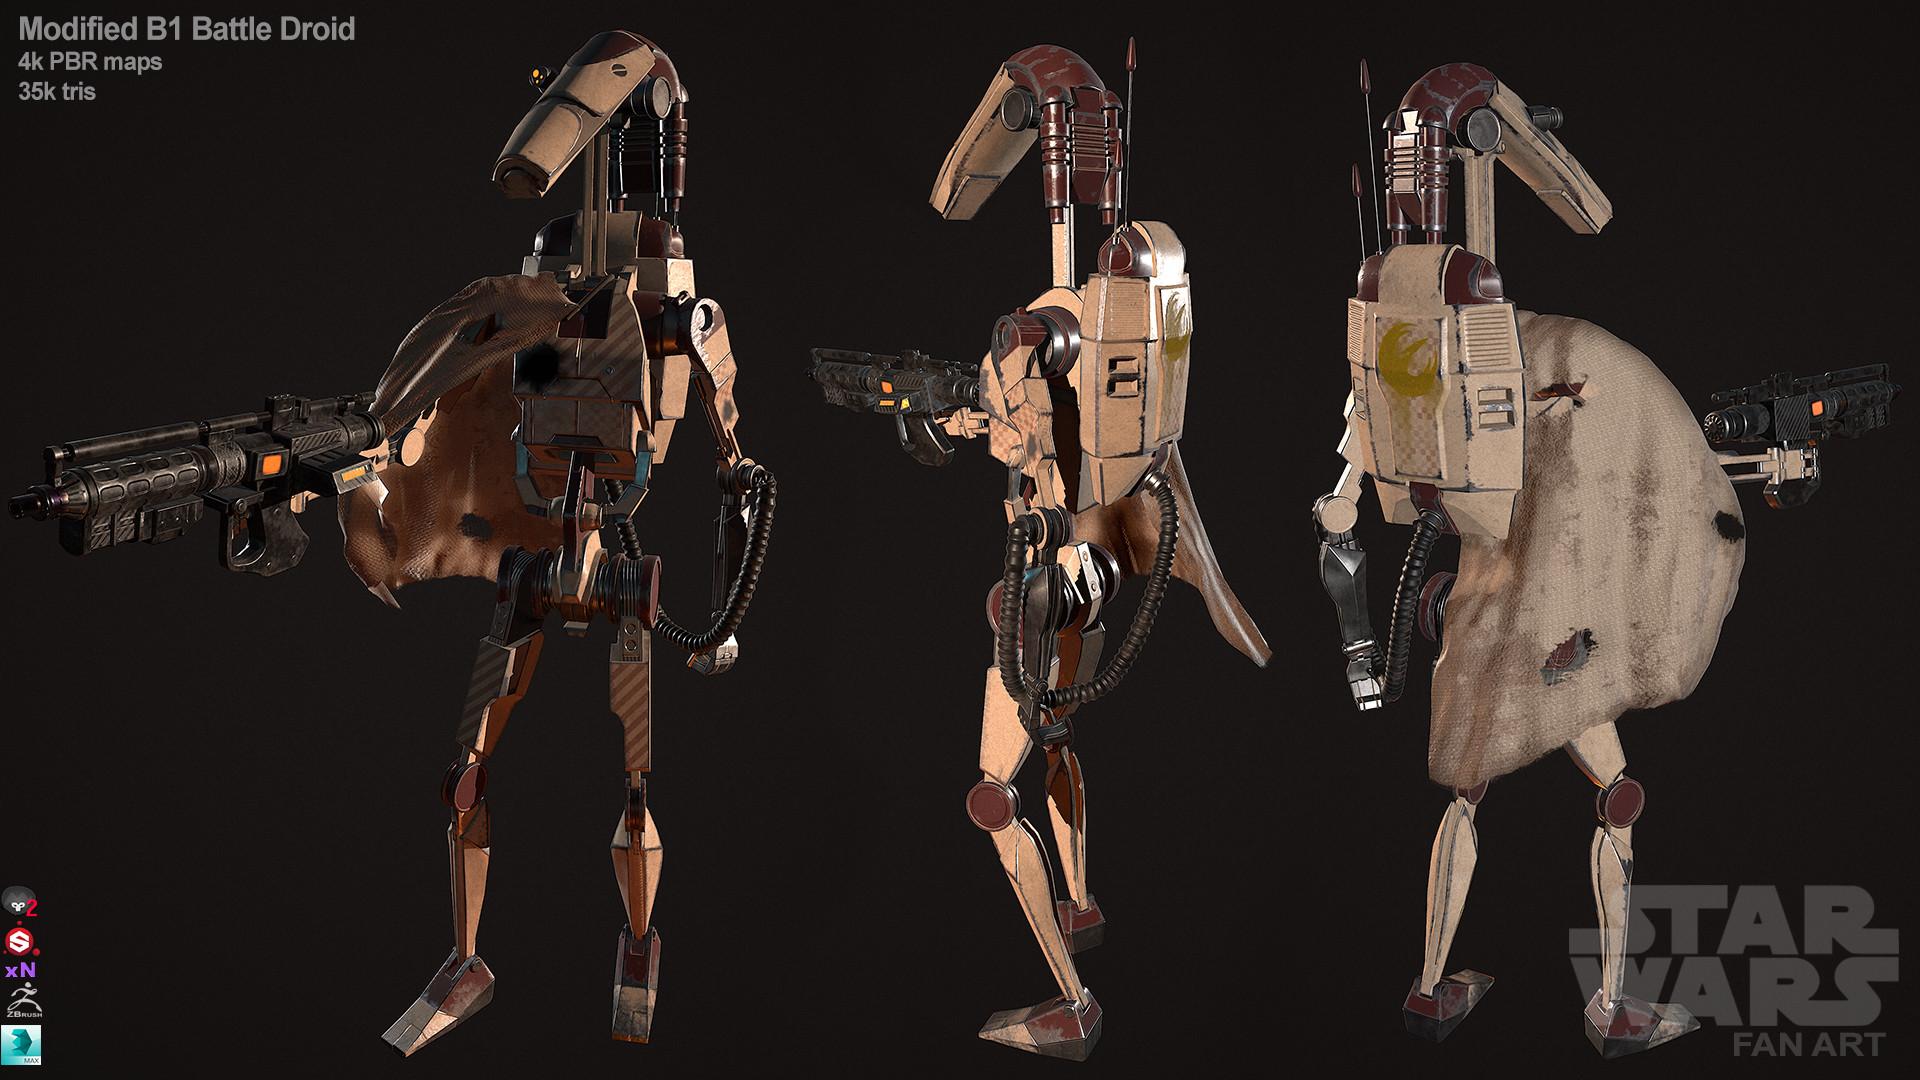 Calvin Simpson Modified B1 Battle Droid Star Wars